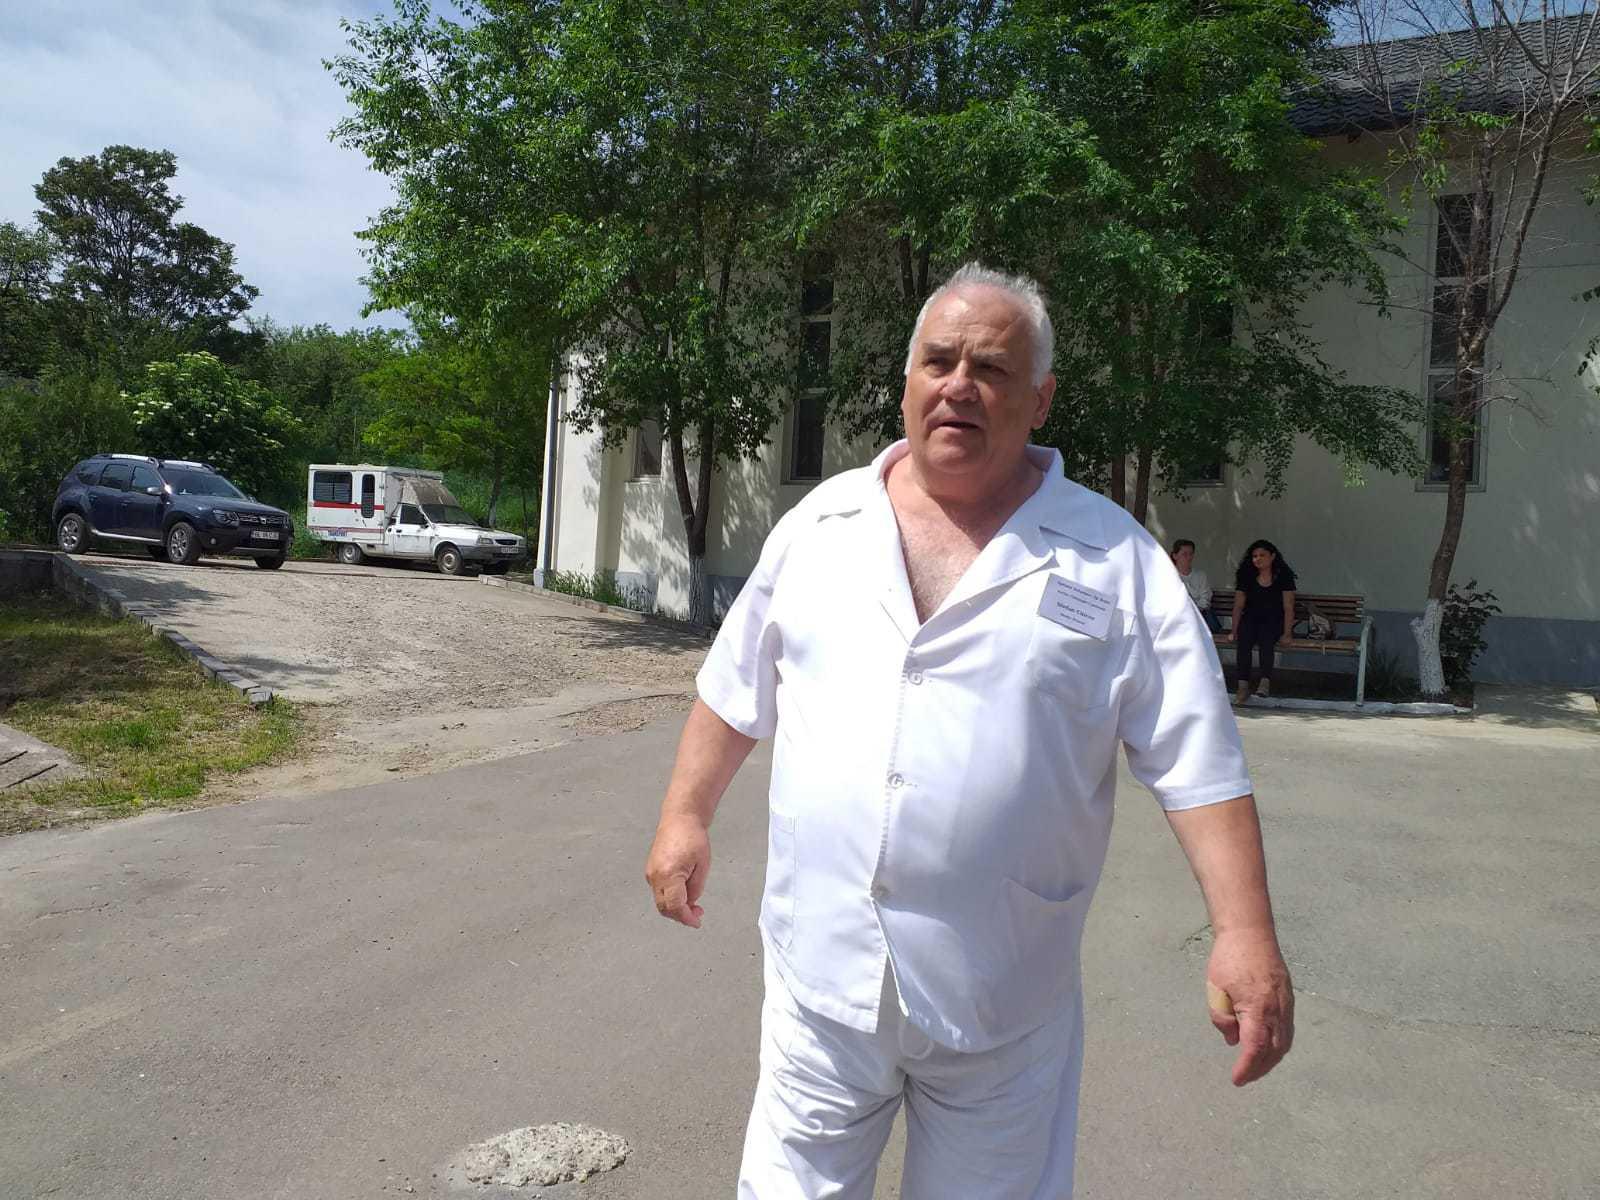 caut barbat singur din târgu bujor)